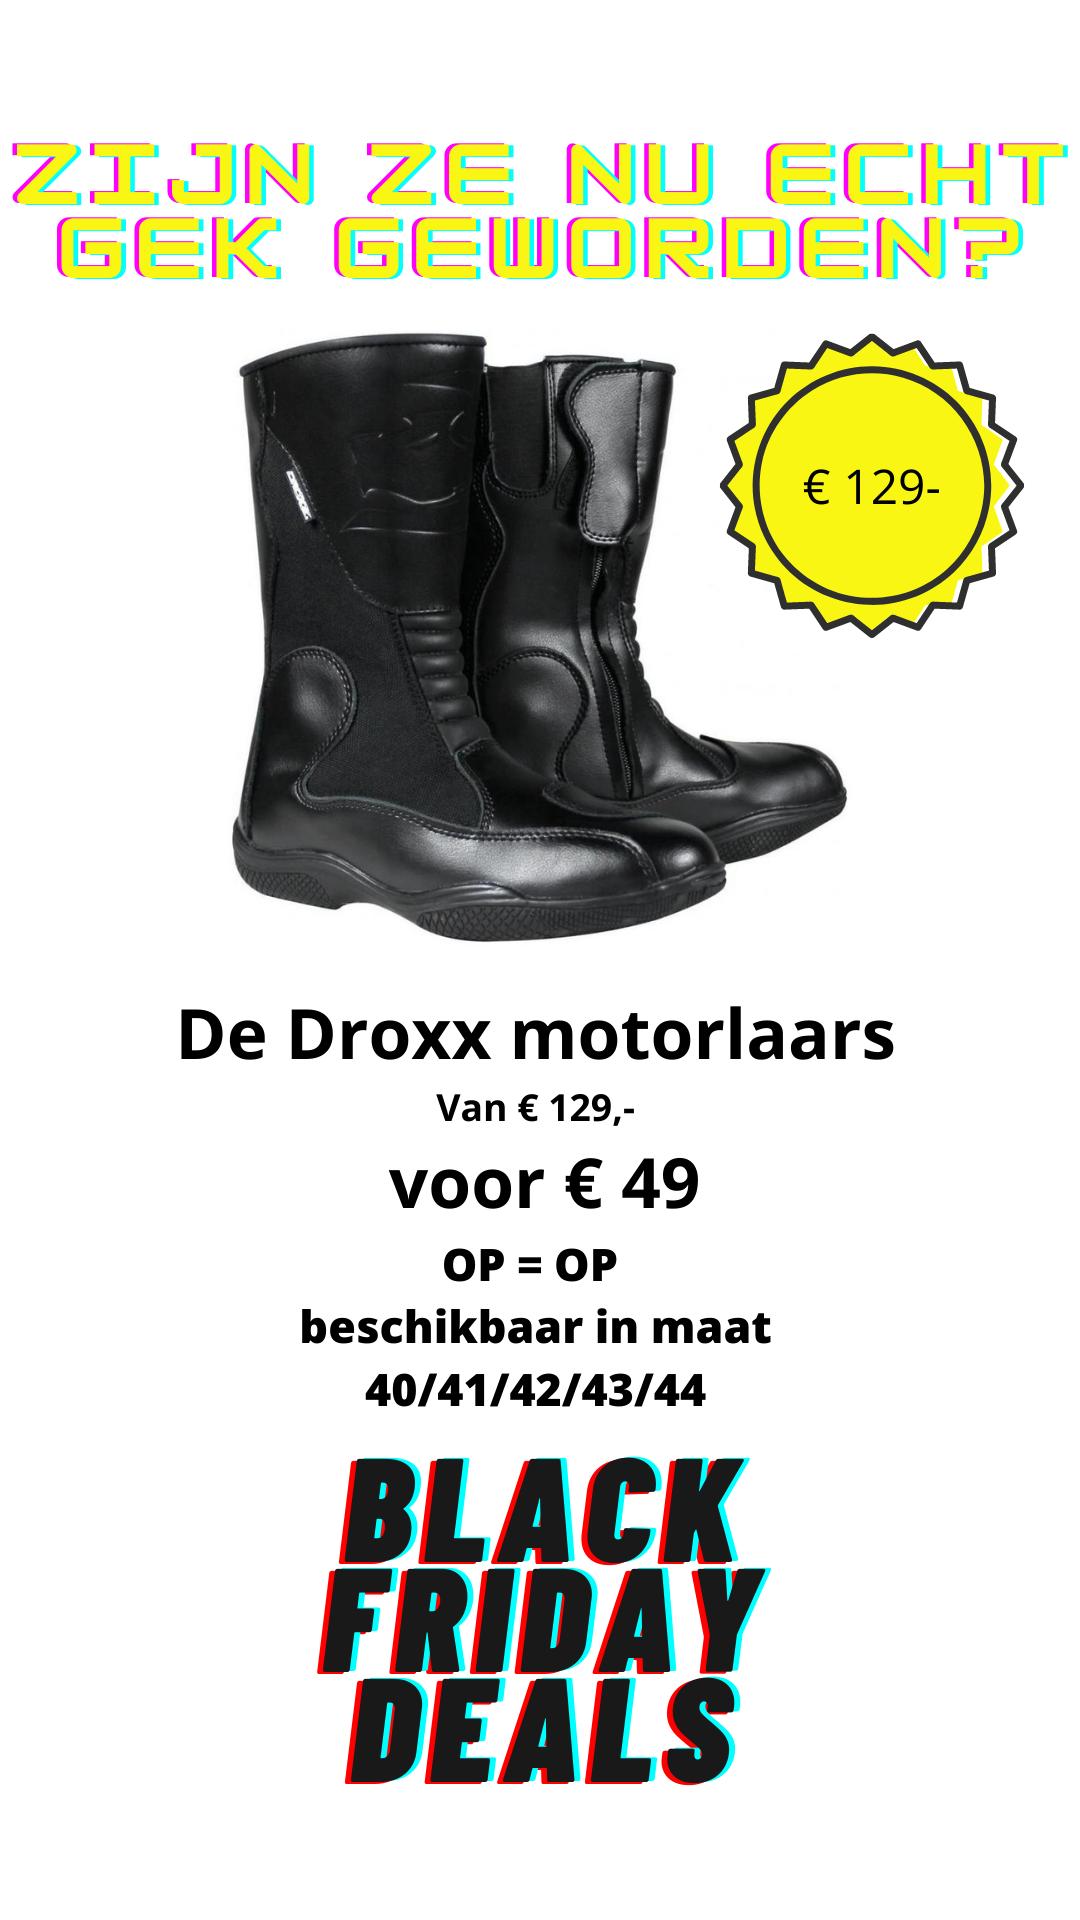 Black friday Droxx deal